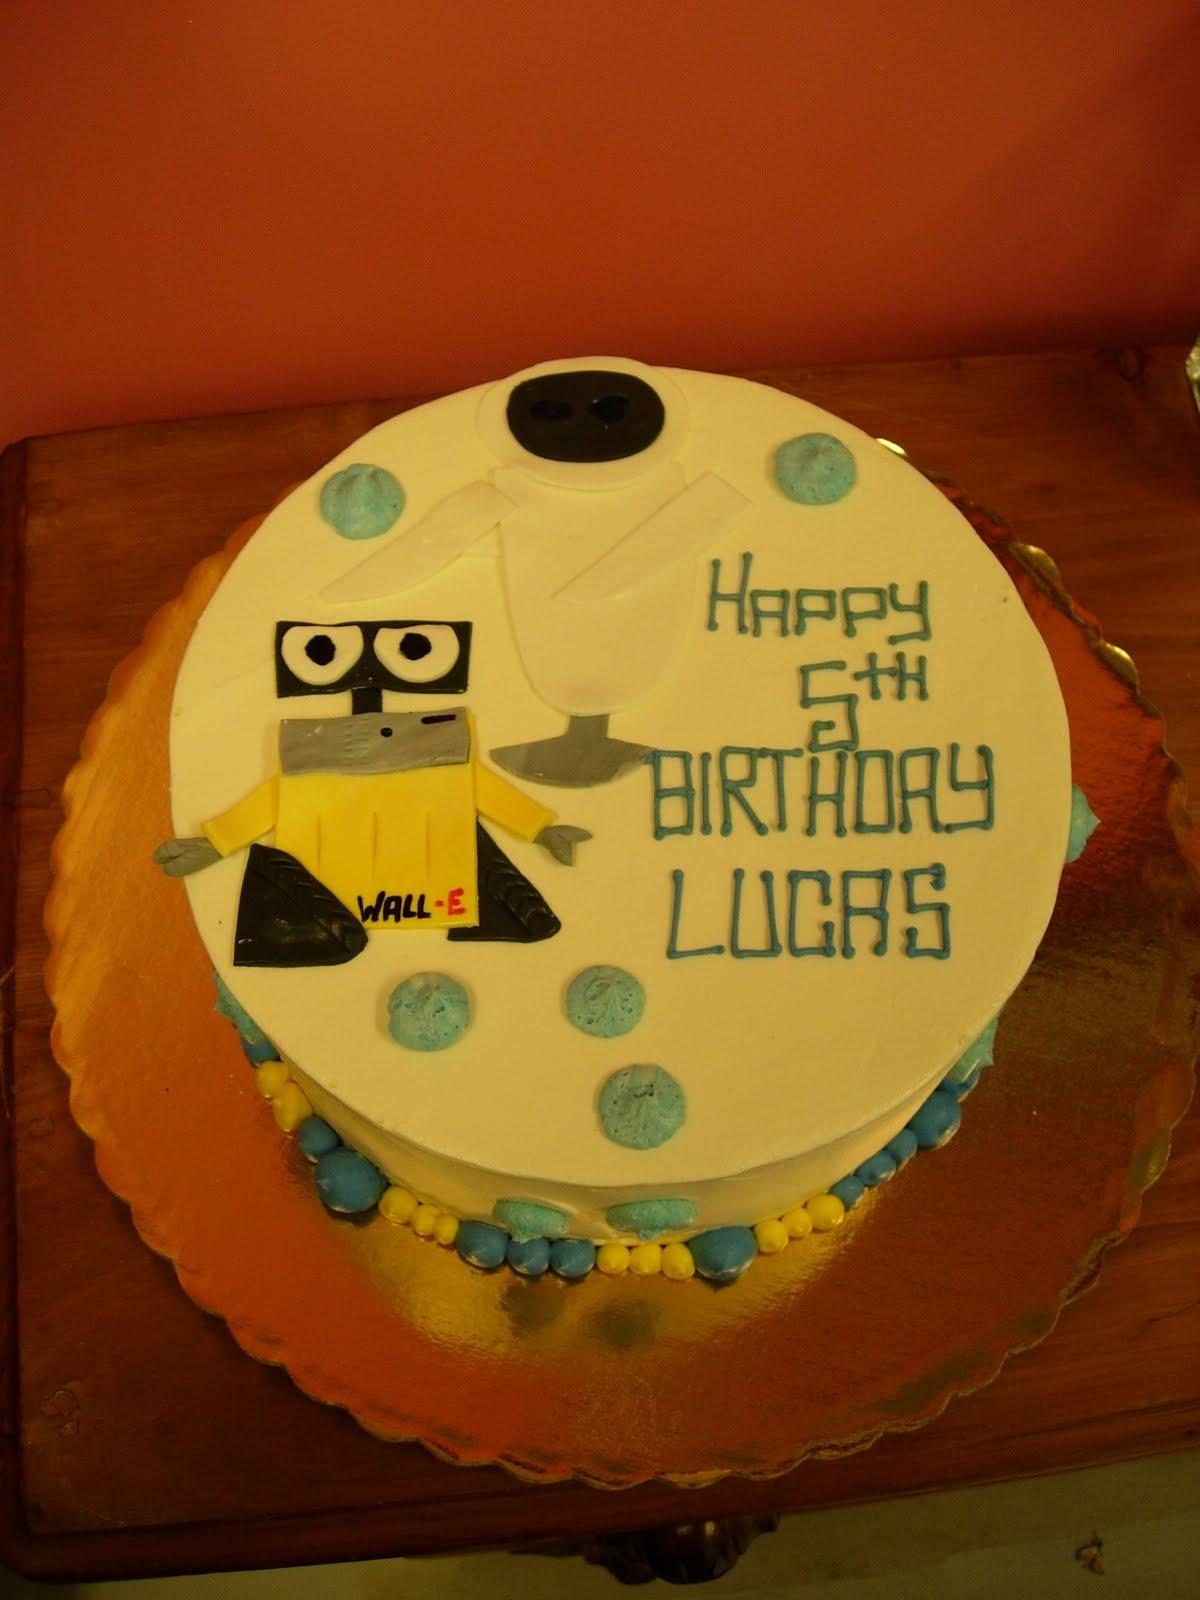 Artisan Bake Shop: April 2010